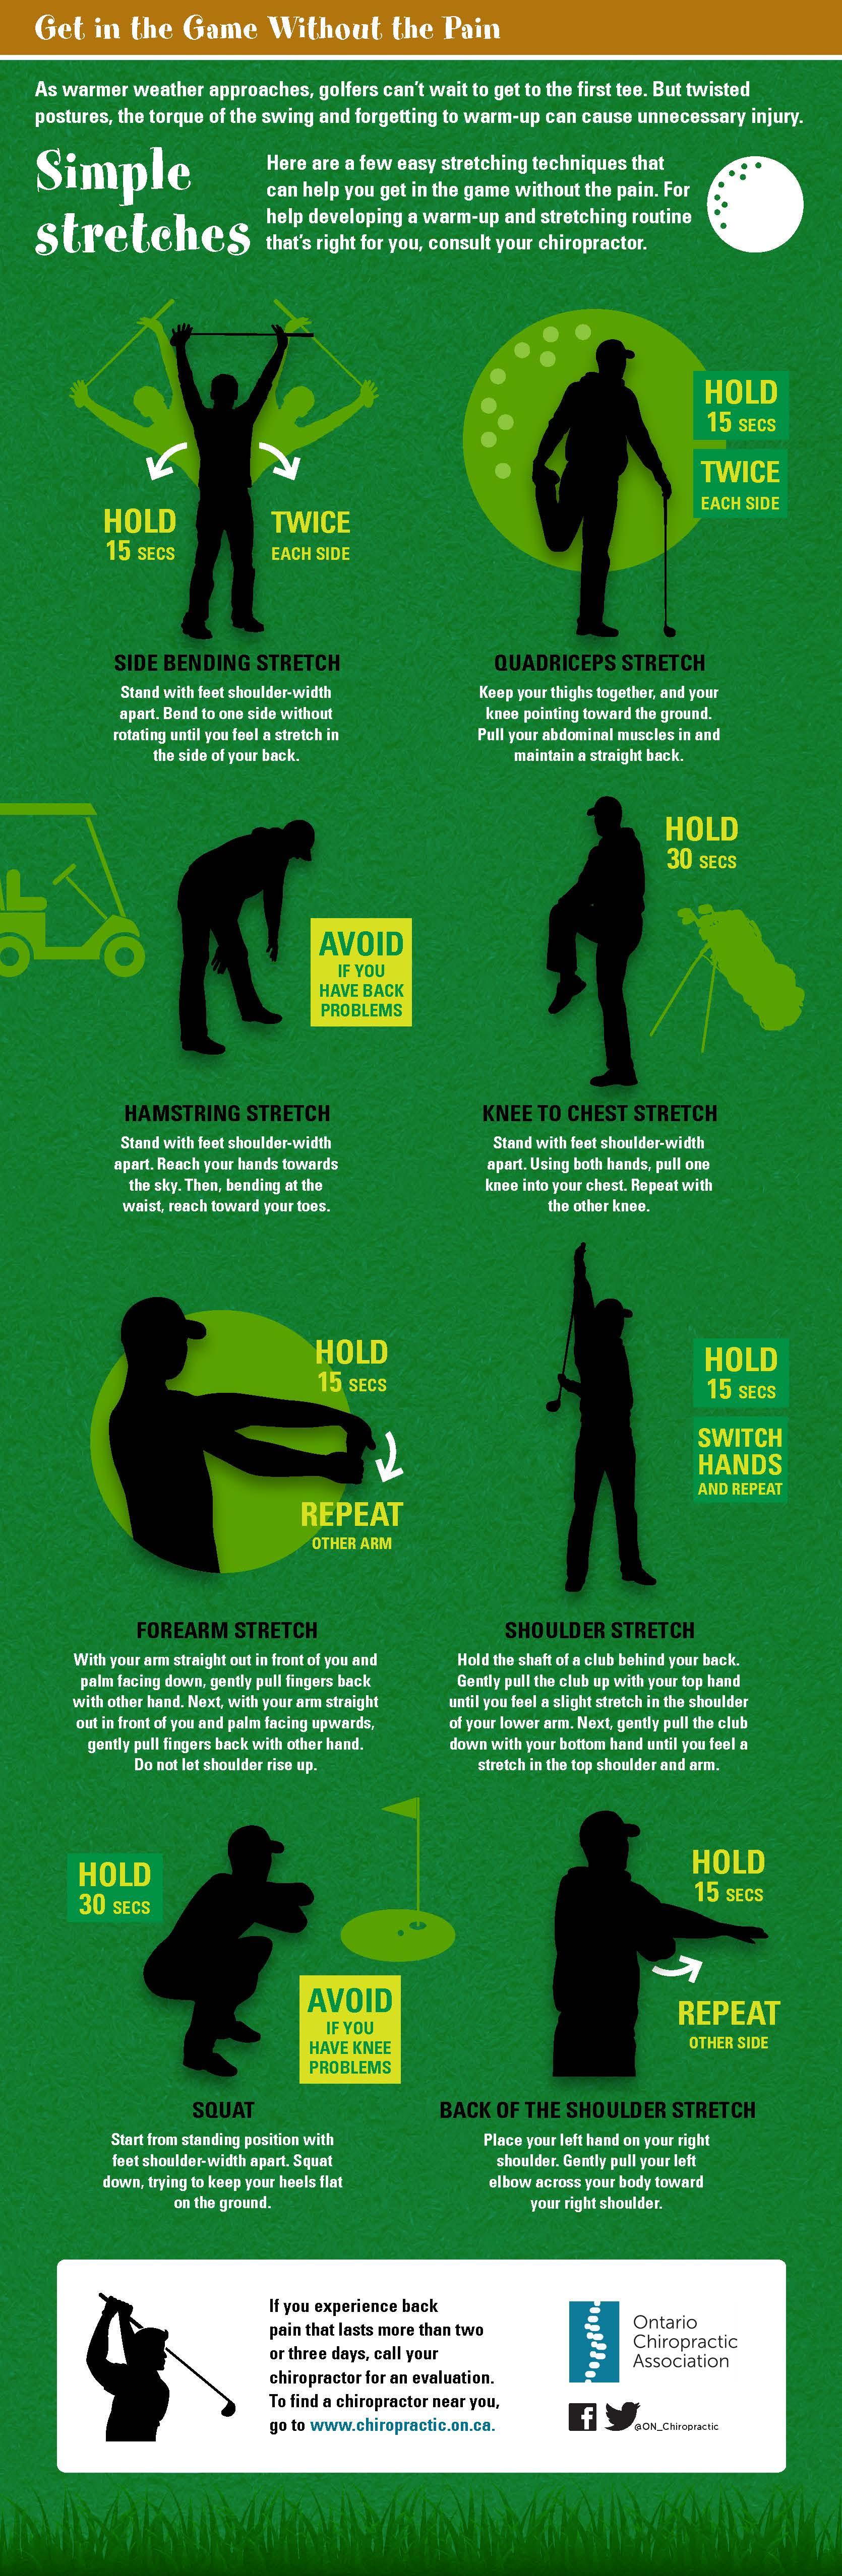 OCA_Golf_Infographic